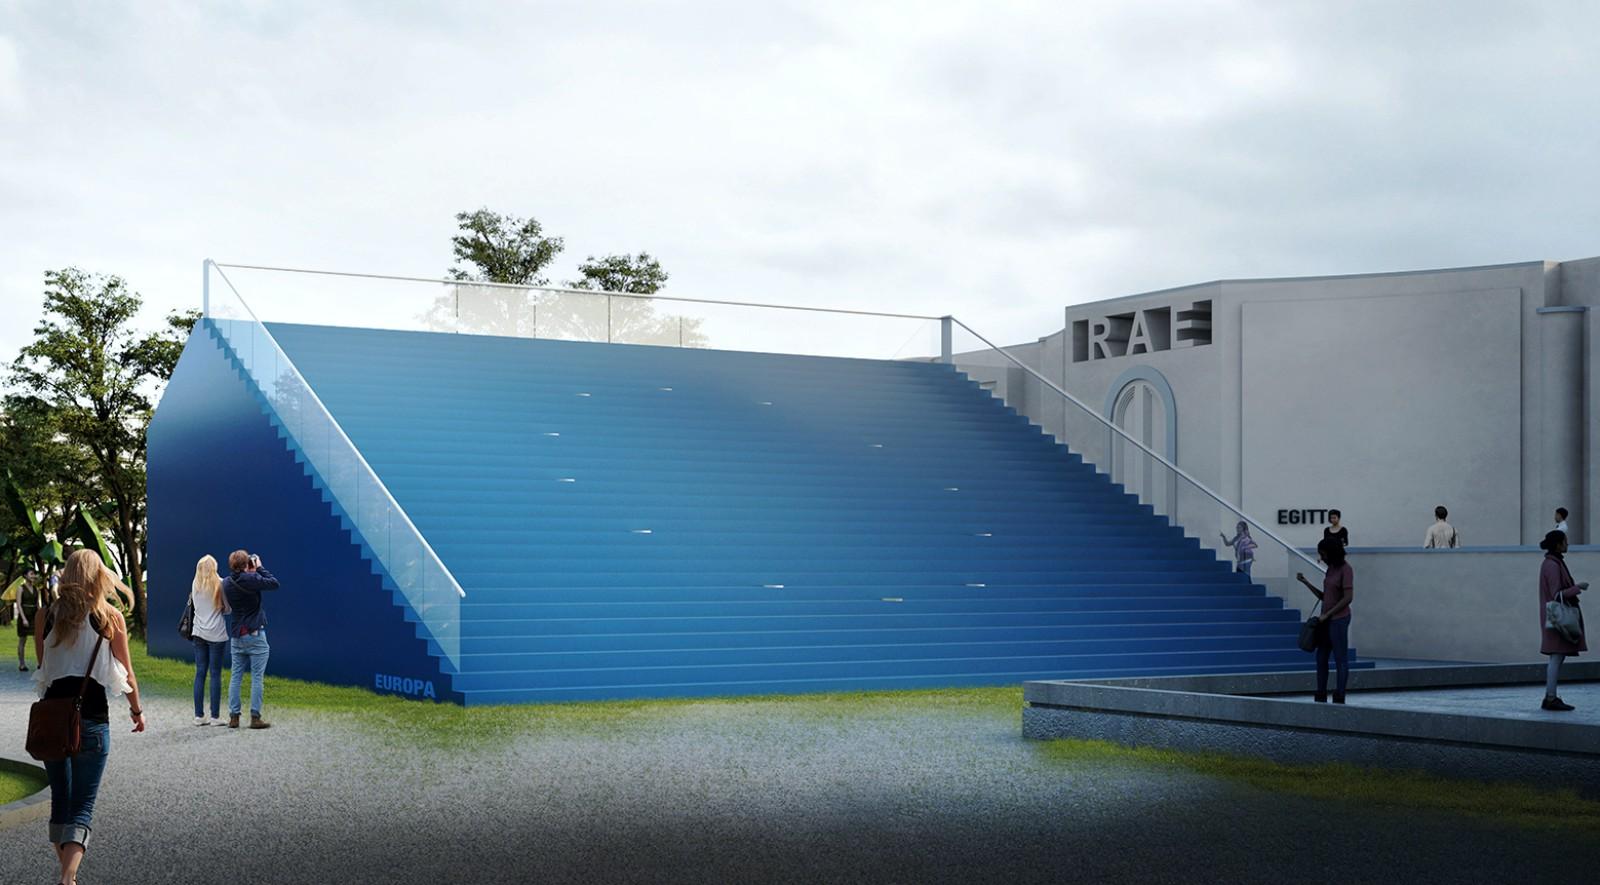 Europe Pavilion